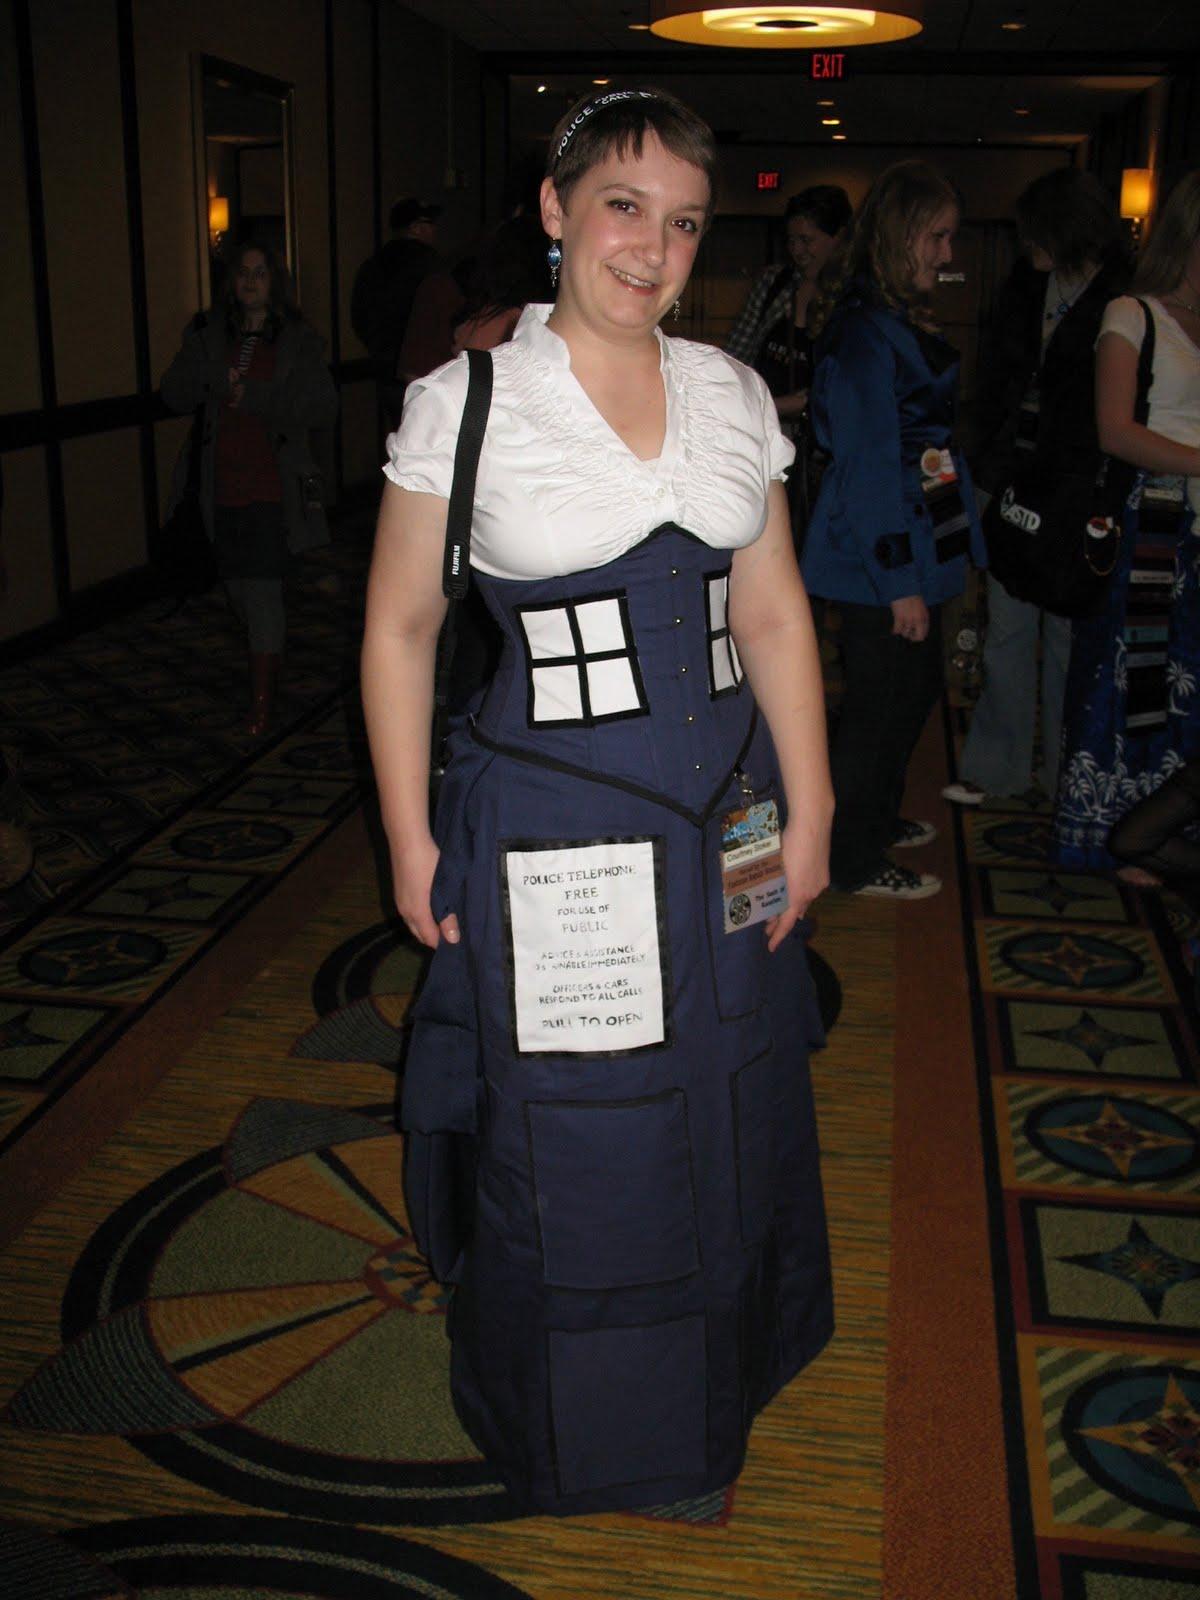 Fabuleux Steampunk, Tech, and TARDISes: A Cosplay Tale | Geek Feminism Blog YB79